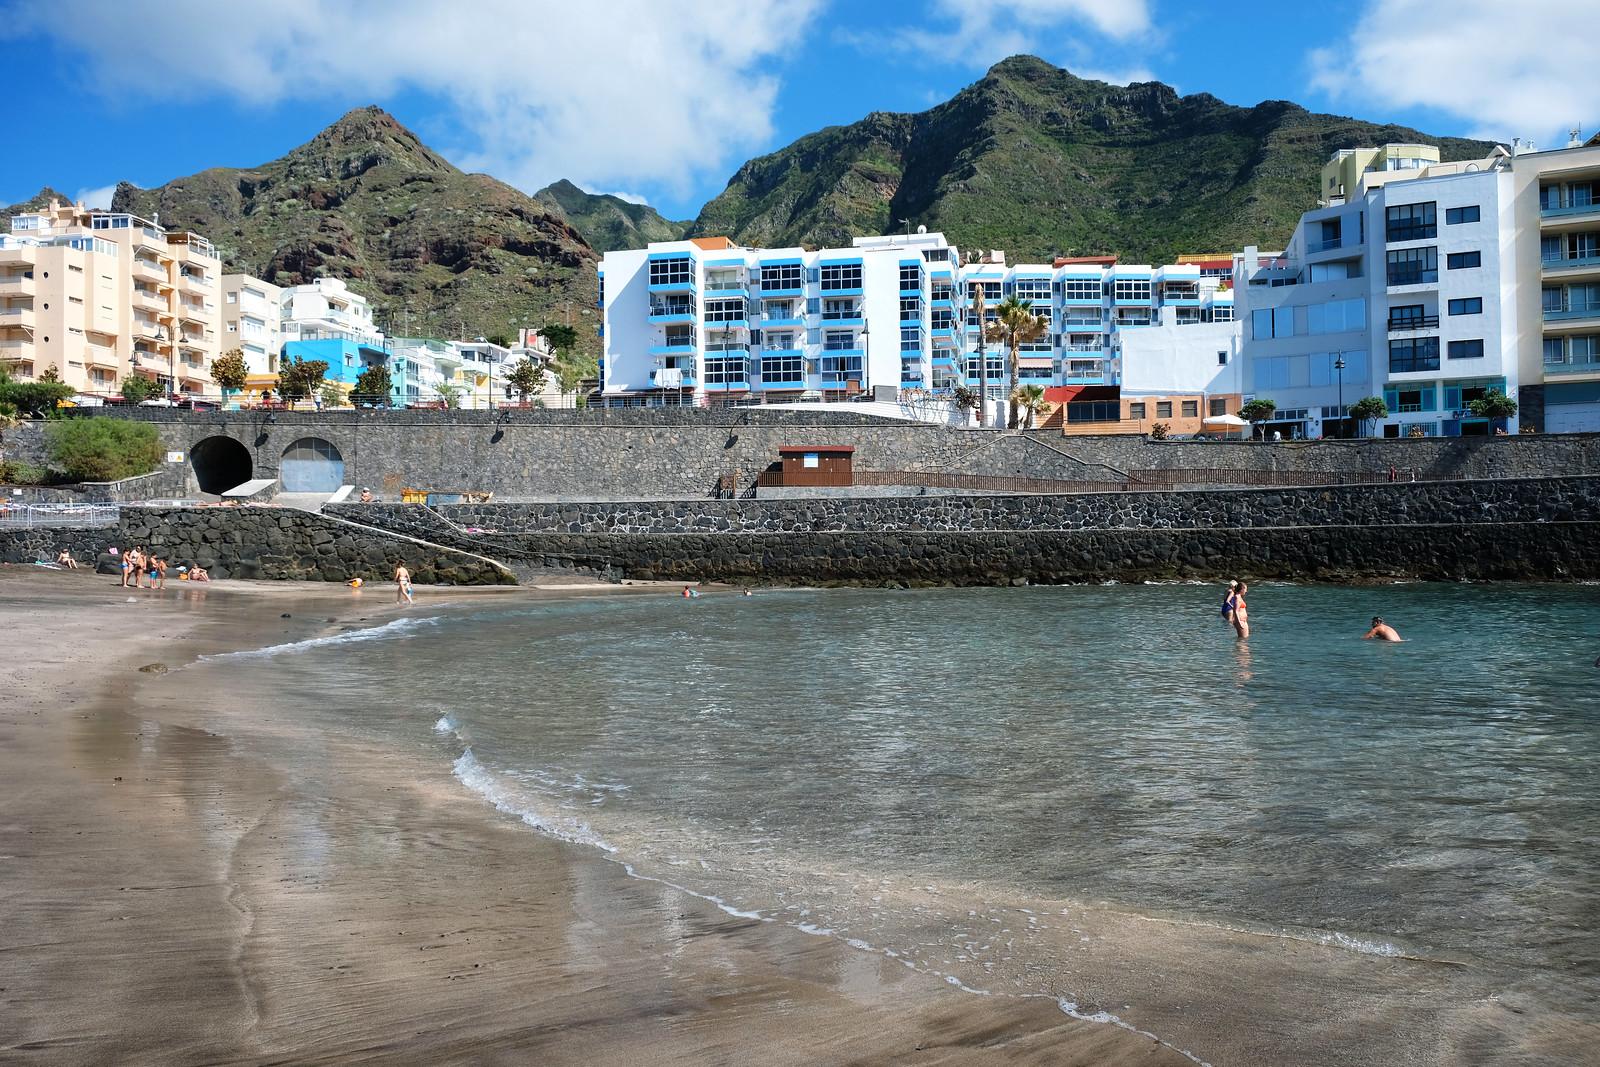 Piscinas de Bajamar, Bajamar, Tenerife, Canary Islands, Spain